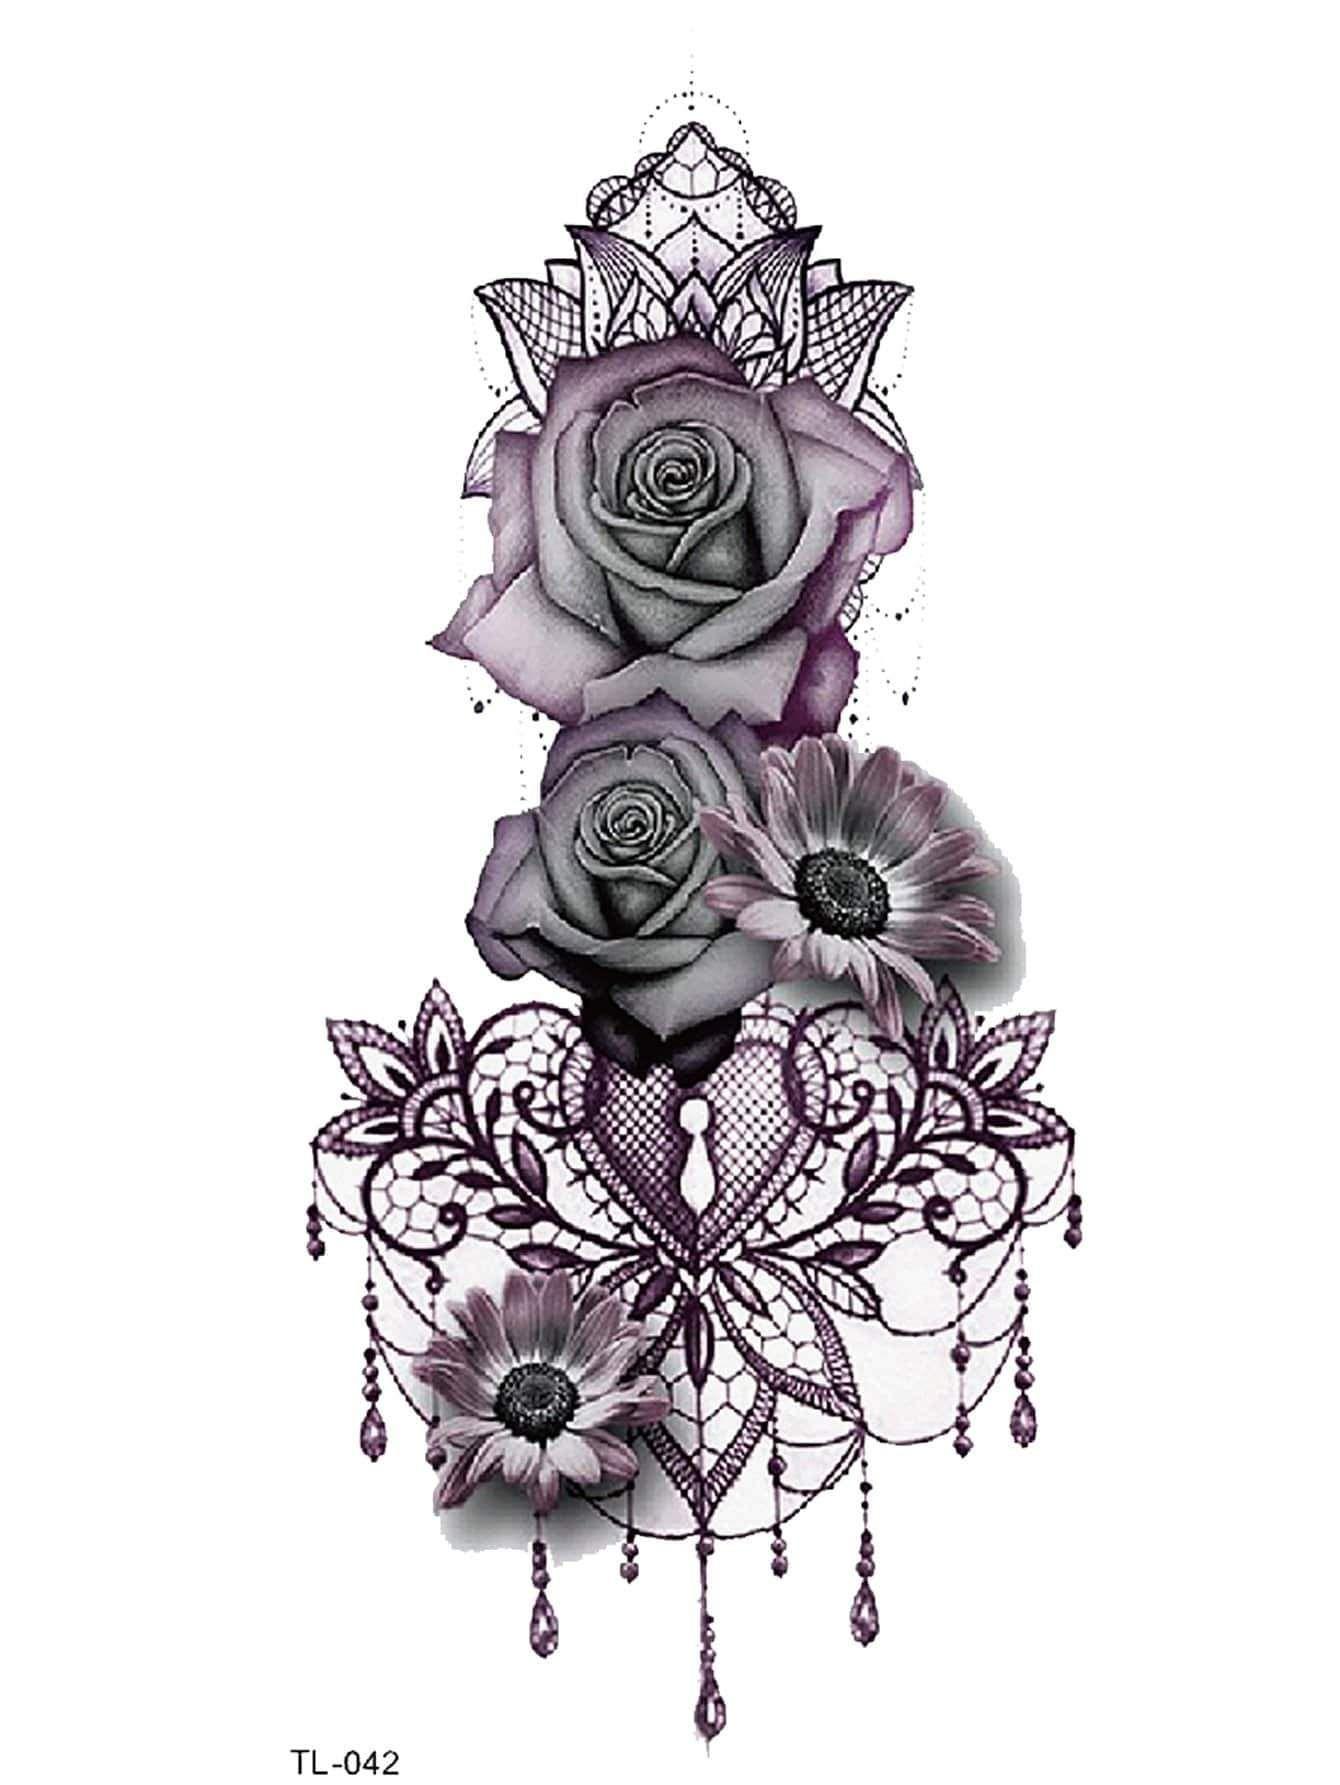 Flower Heart Tattoo Sticker Chicgirlie Lace Flower Tattoos Tattoos For Women Half Sleeve Half Sleeve Tattoo